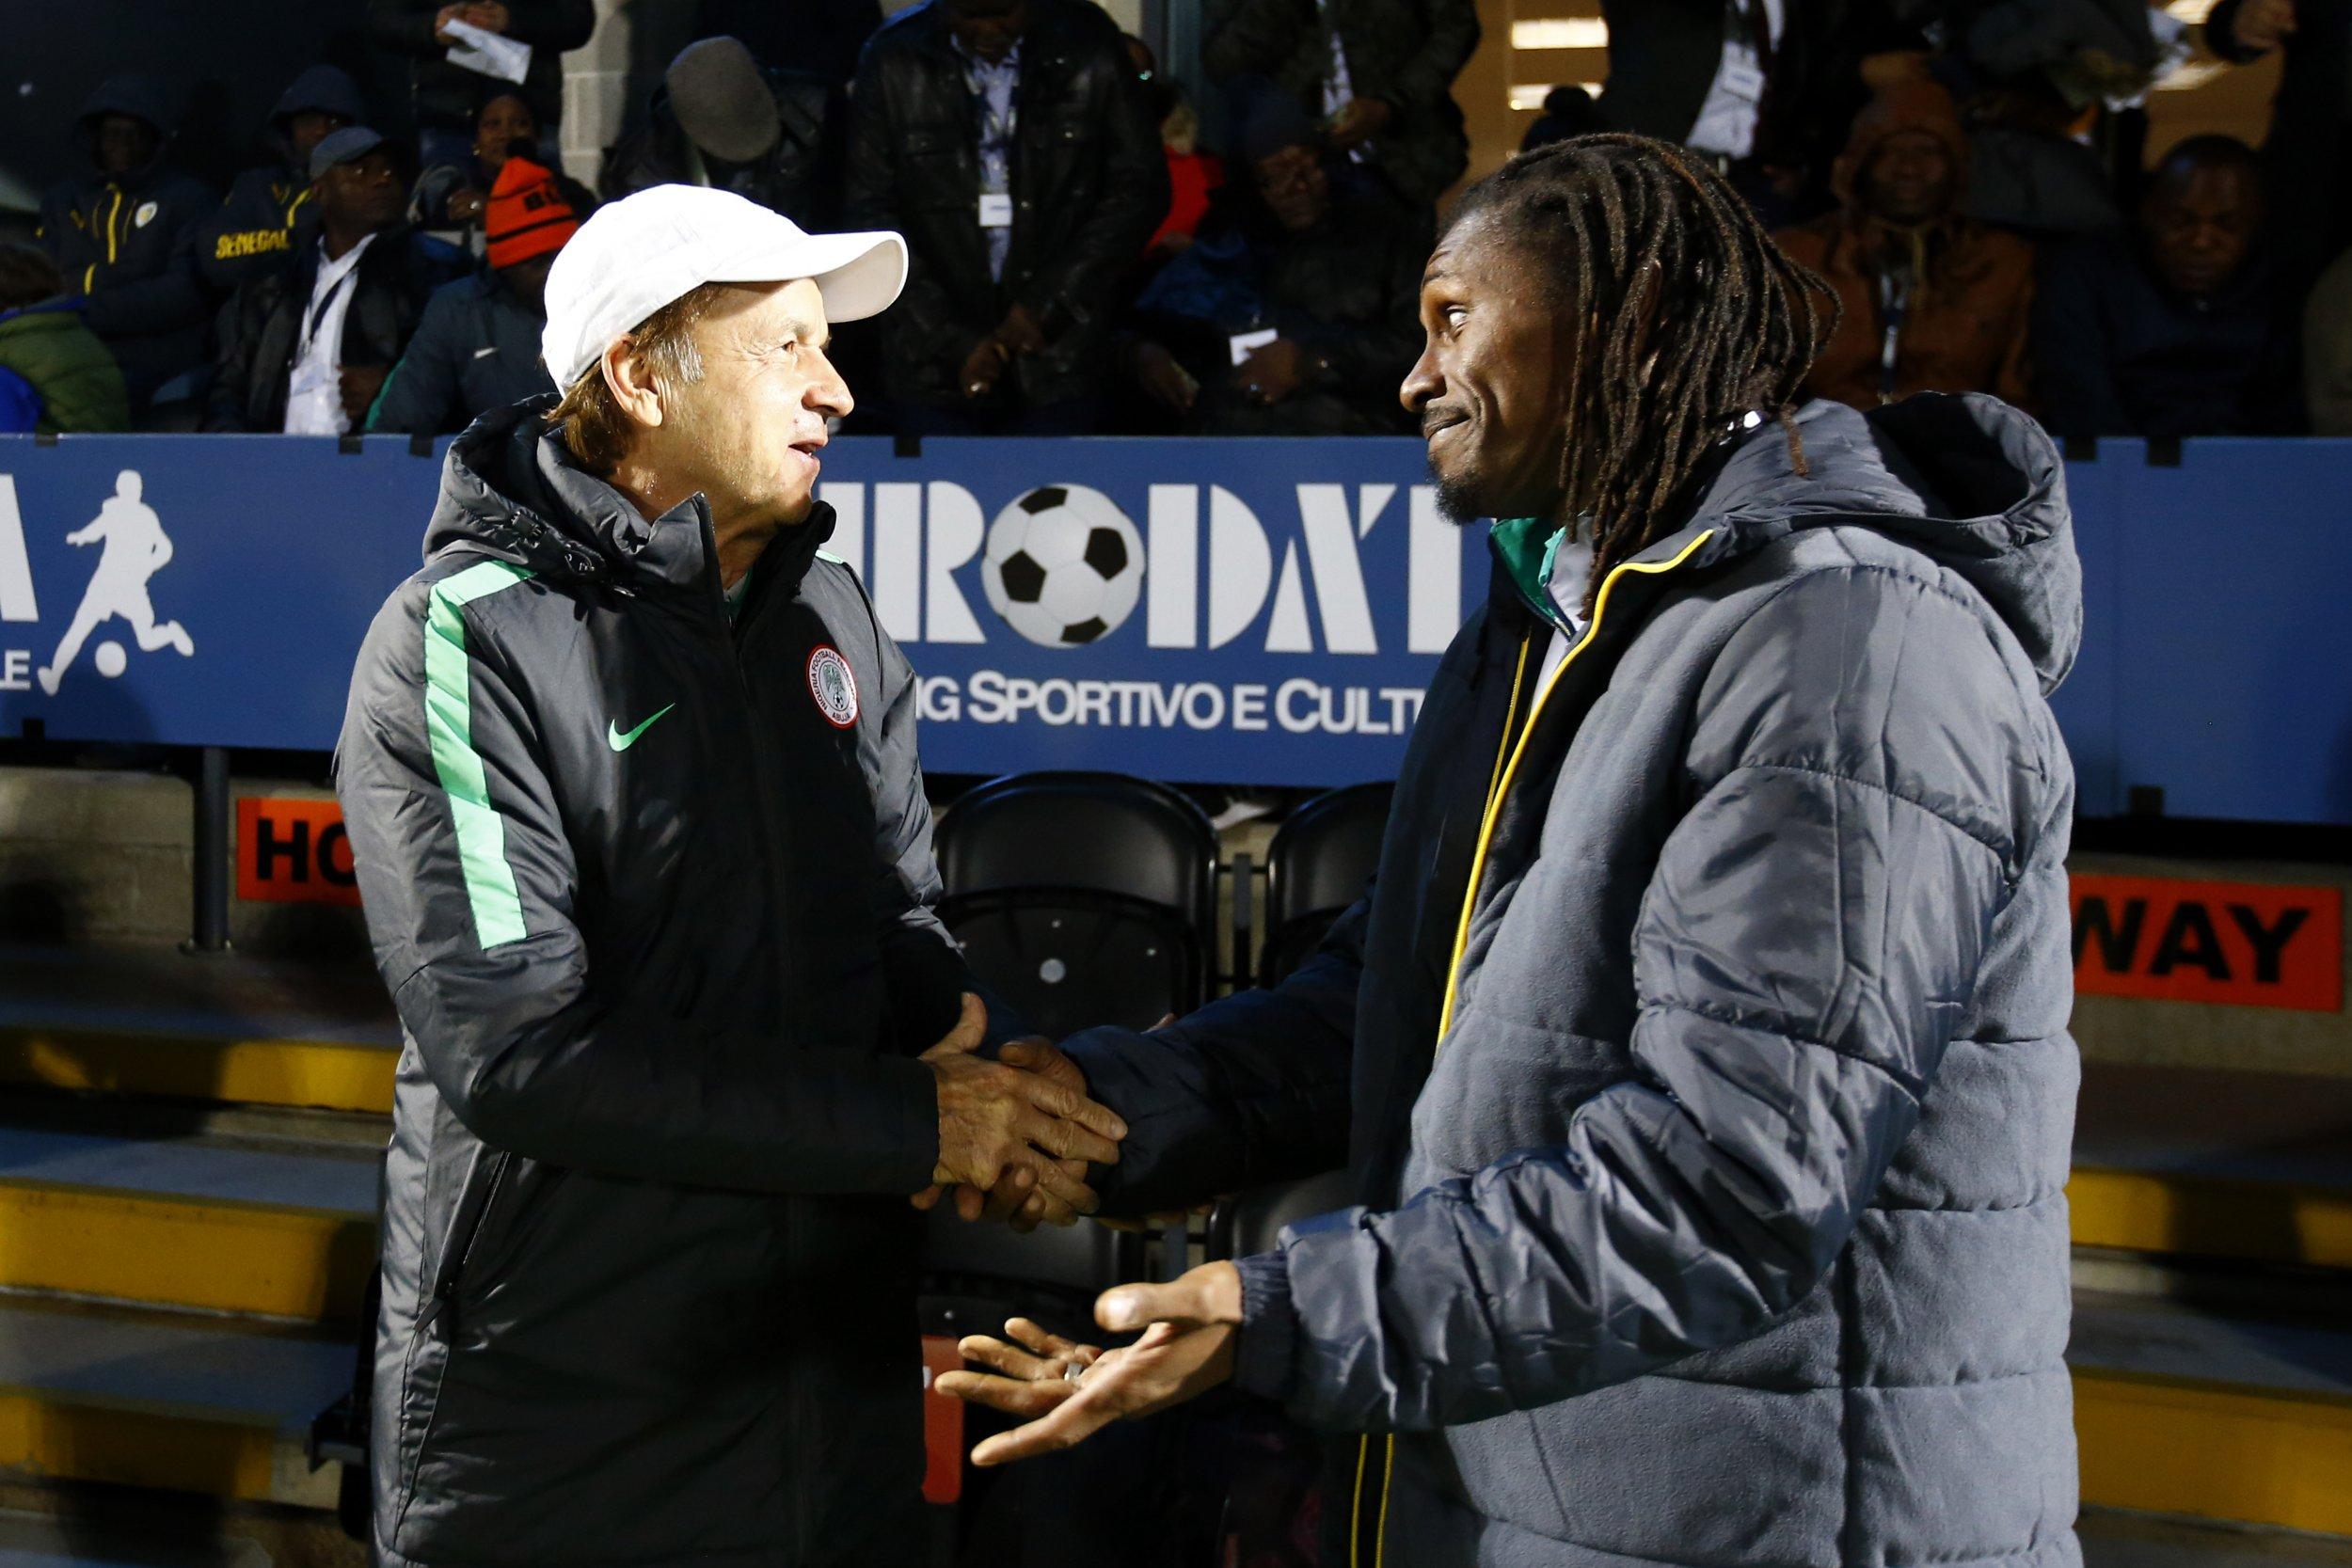 Nigeria coach Gernot Rohr, left, with Senegal coach Aliou Cisse at The Hive, Barnet, London, March 23.